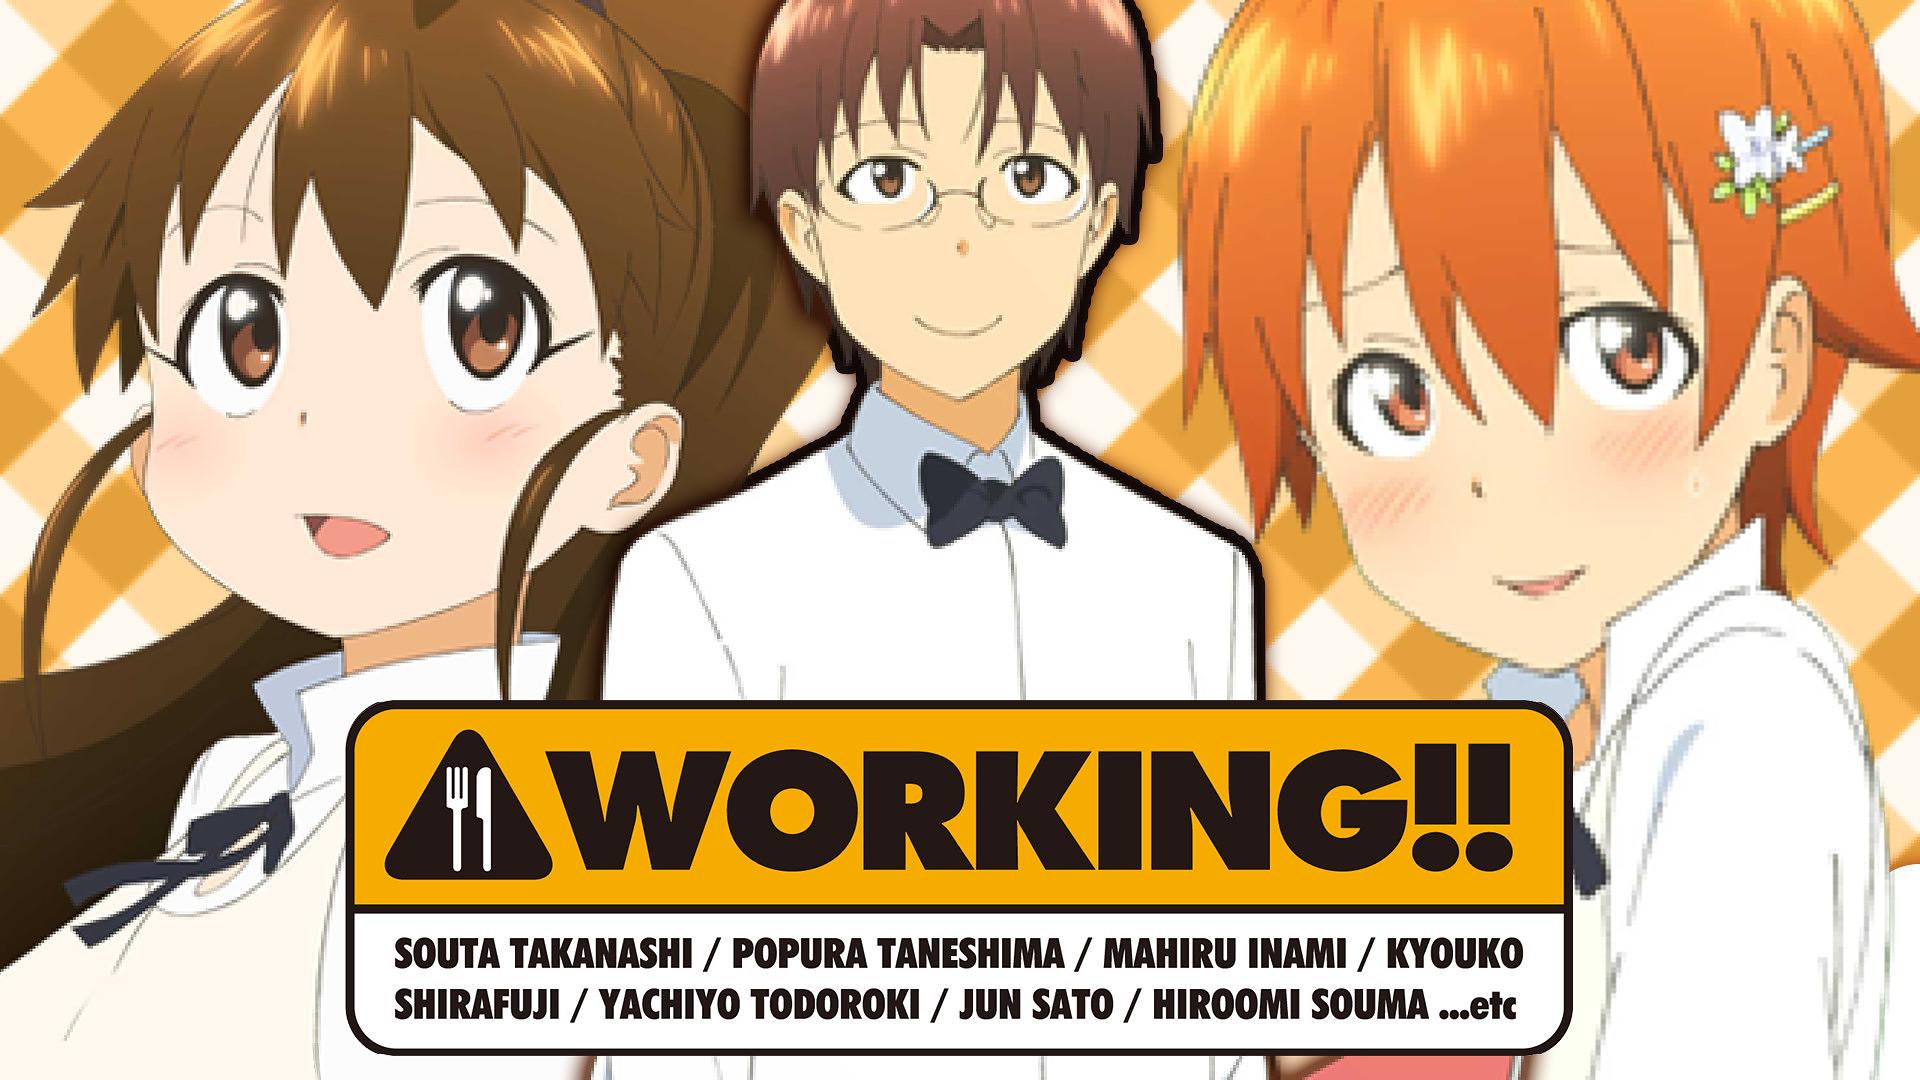 WORKING!! | アニメ動画見放題 | dアニメストア